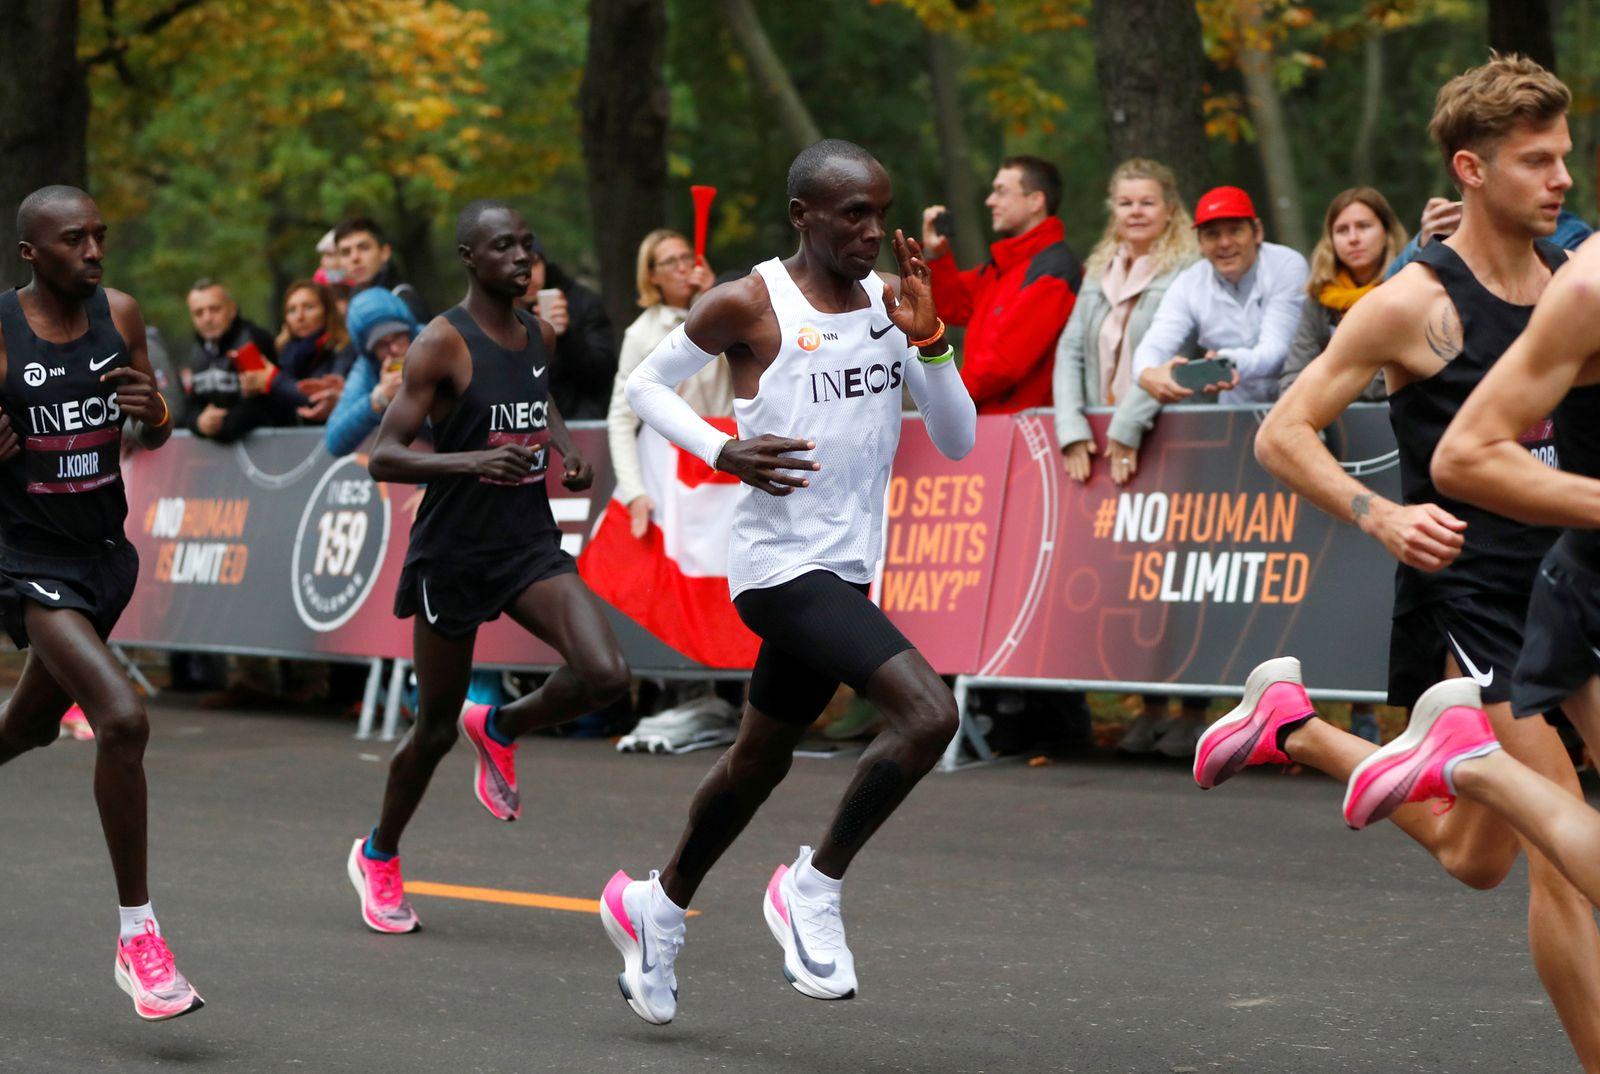 FILE PHOTO: Eliud Kipchoge, the marathon world record holder from Kenya, attempts to run a marathon in under two hours in Vienna